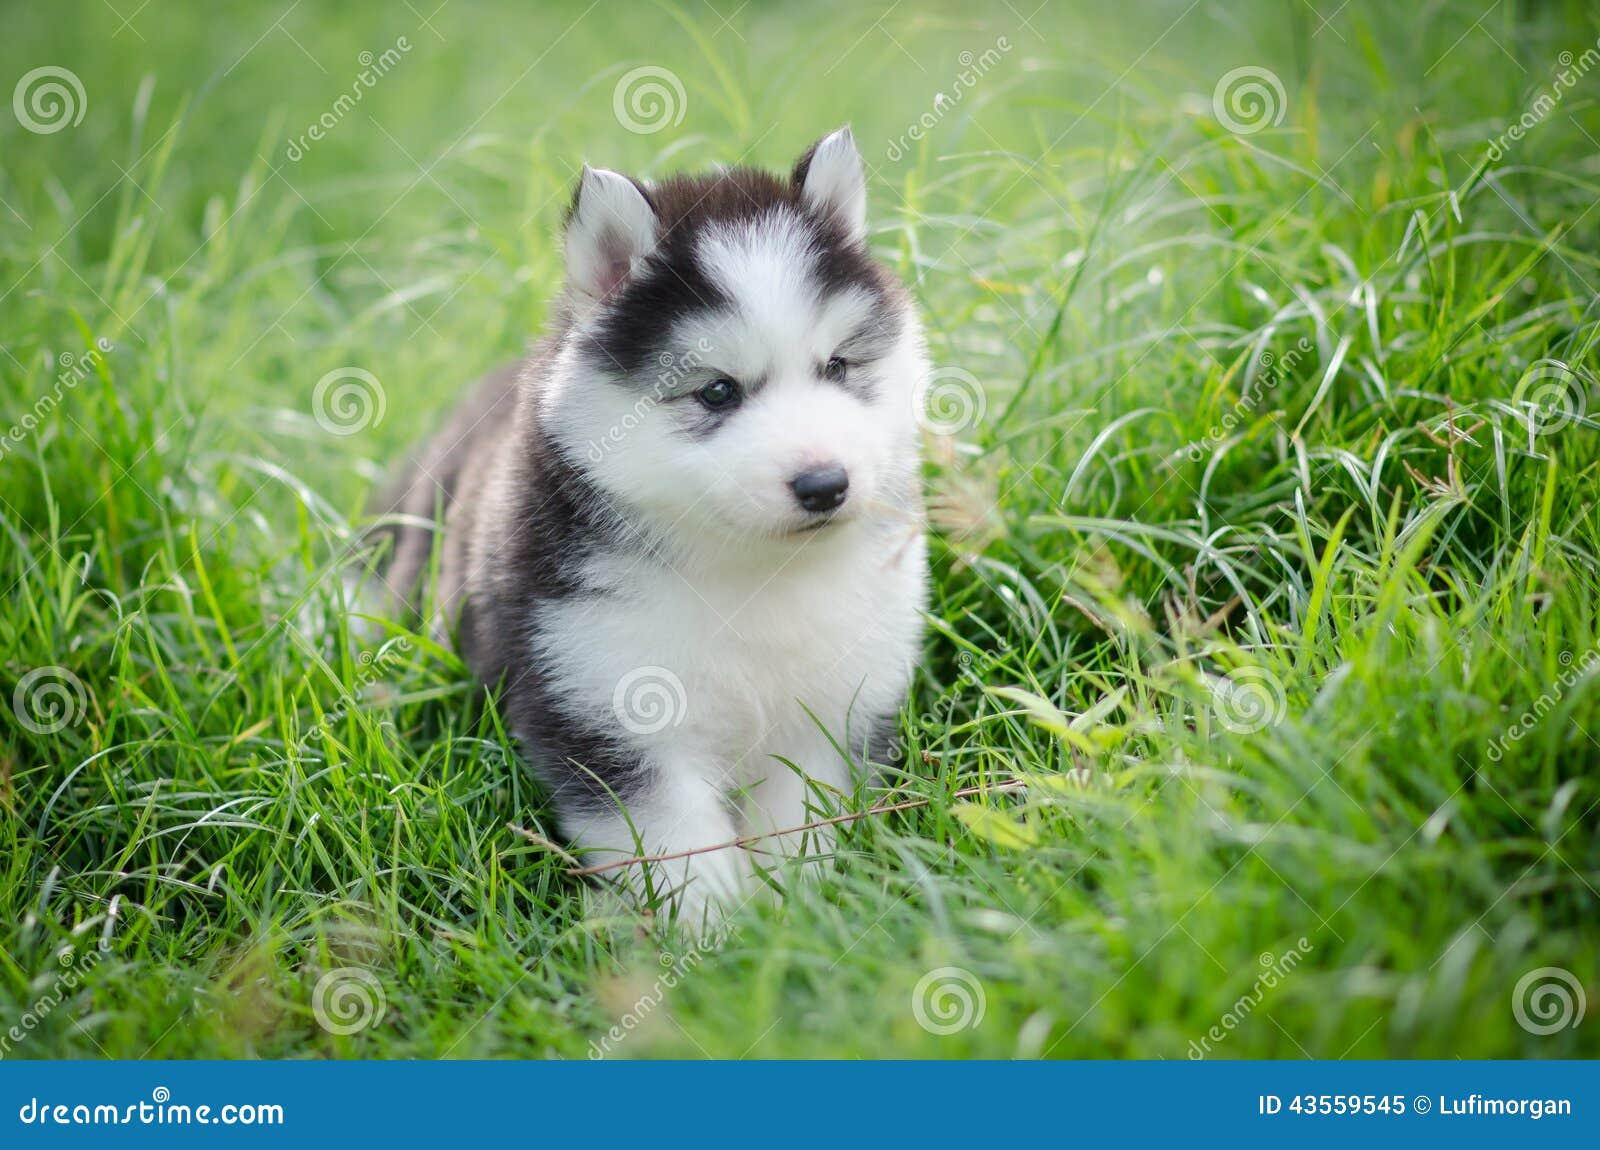 Cute Puppy Siberian Husky Stock Image Image Of Purebred 43559545